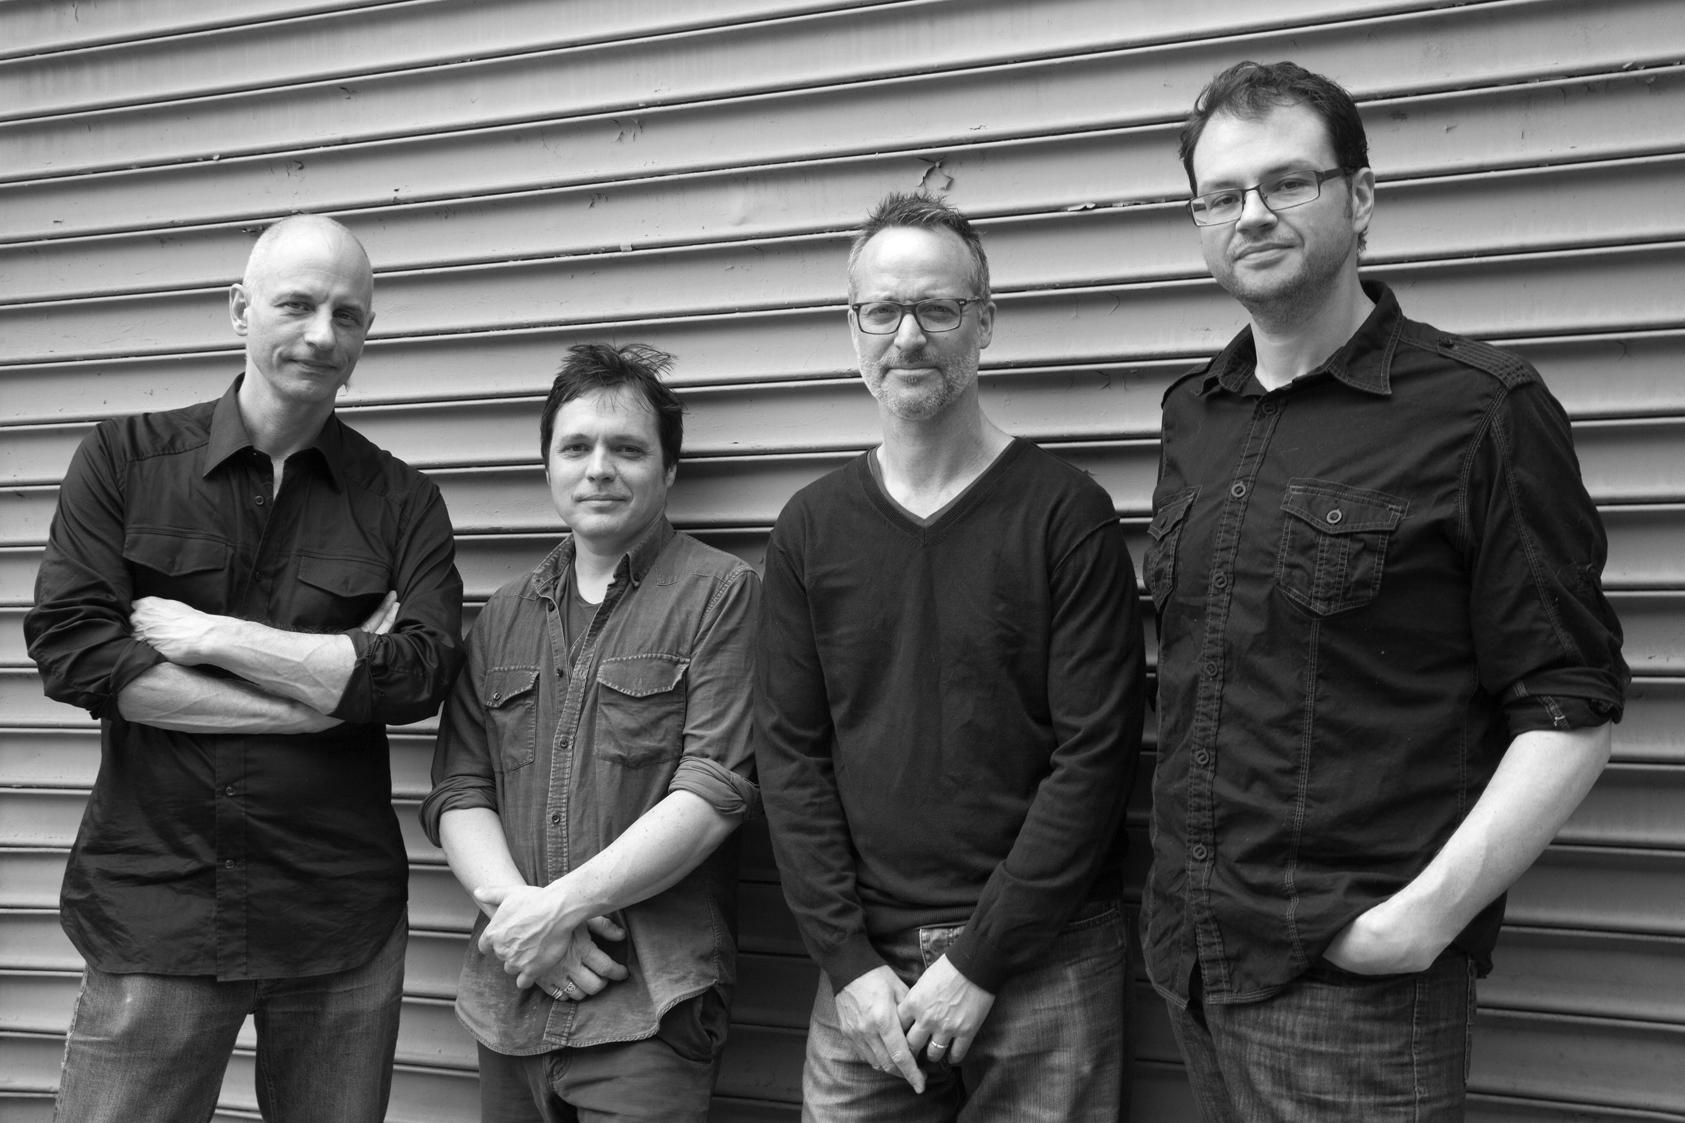 Erik Friedlander, cello; Trevor Dunn, bass; Michael Sarin, drums; Doug Wamble, guitar